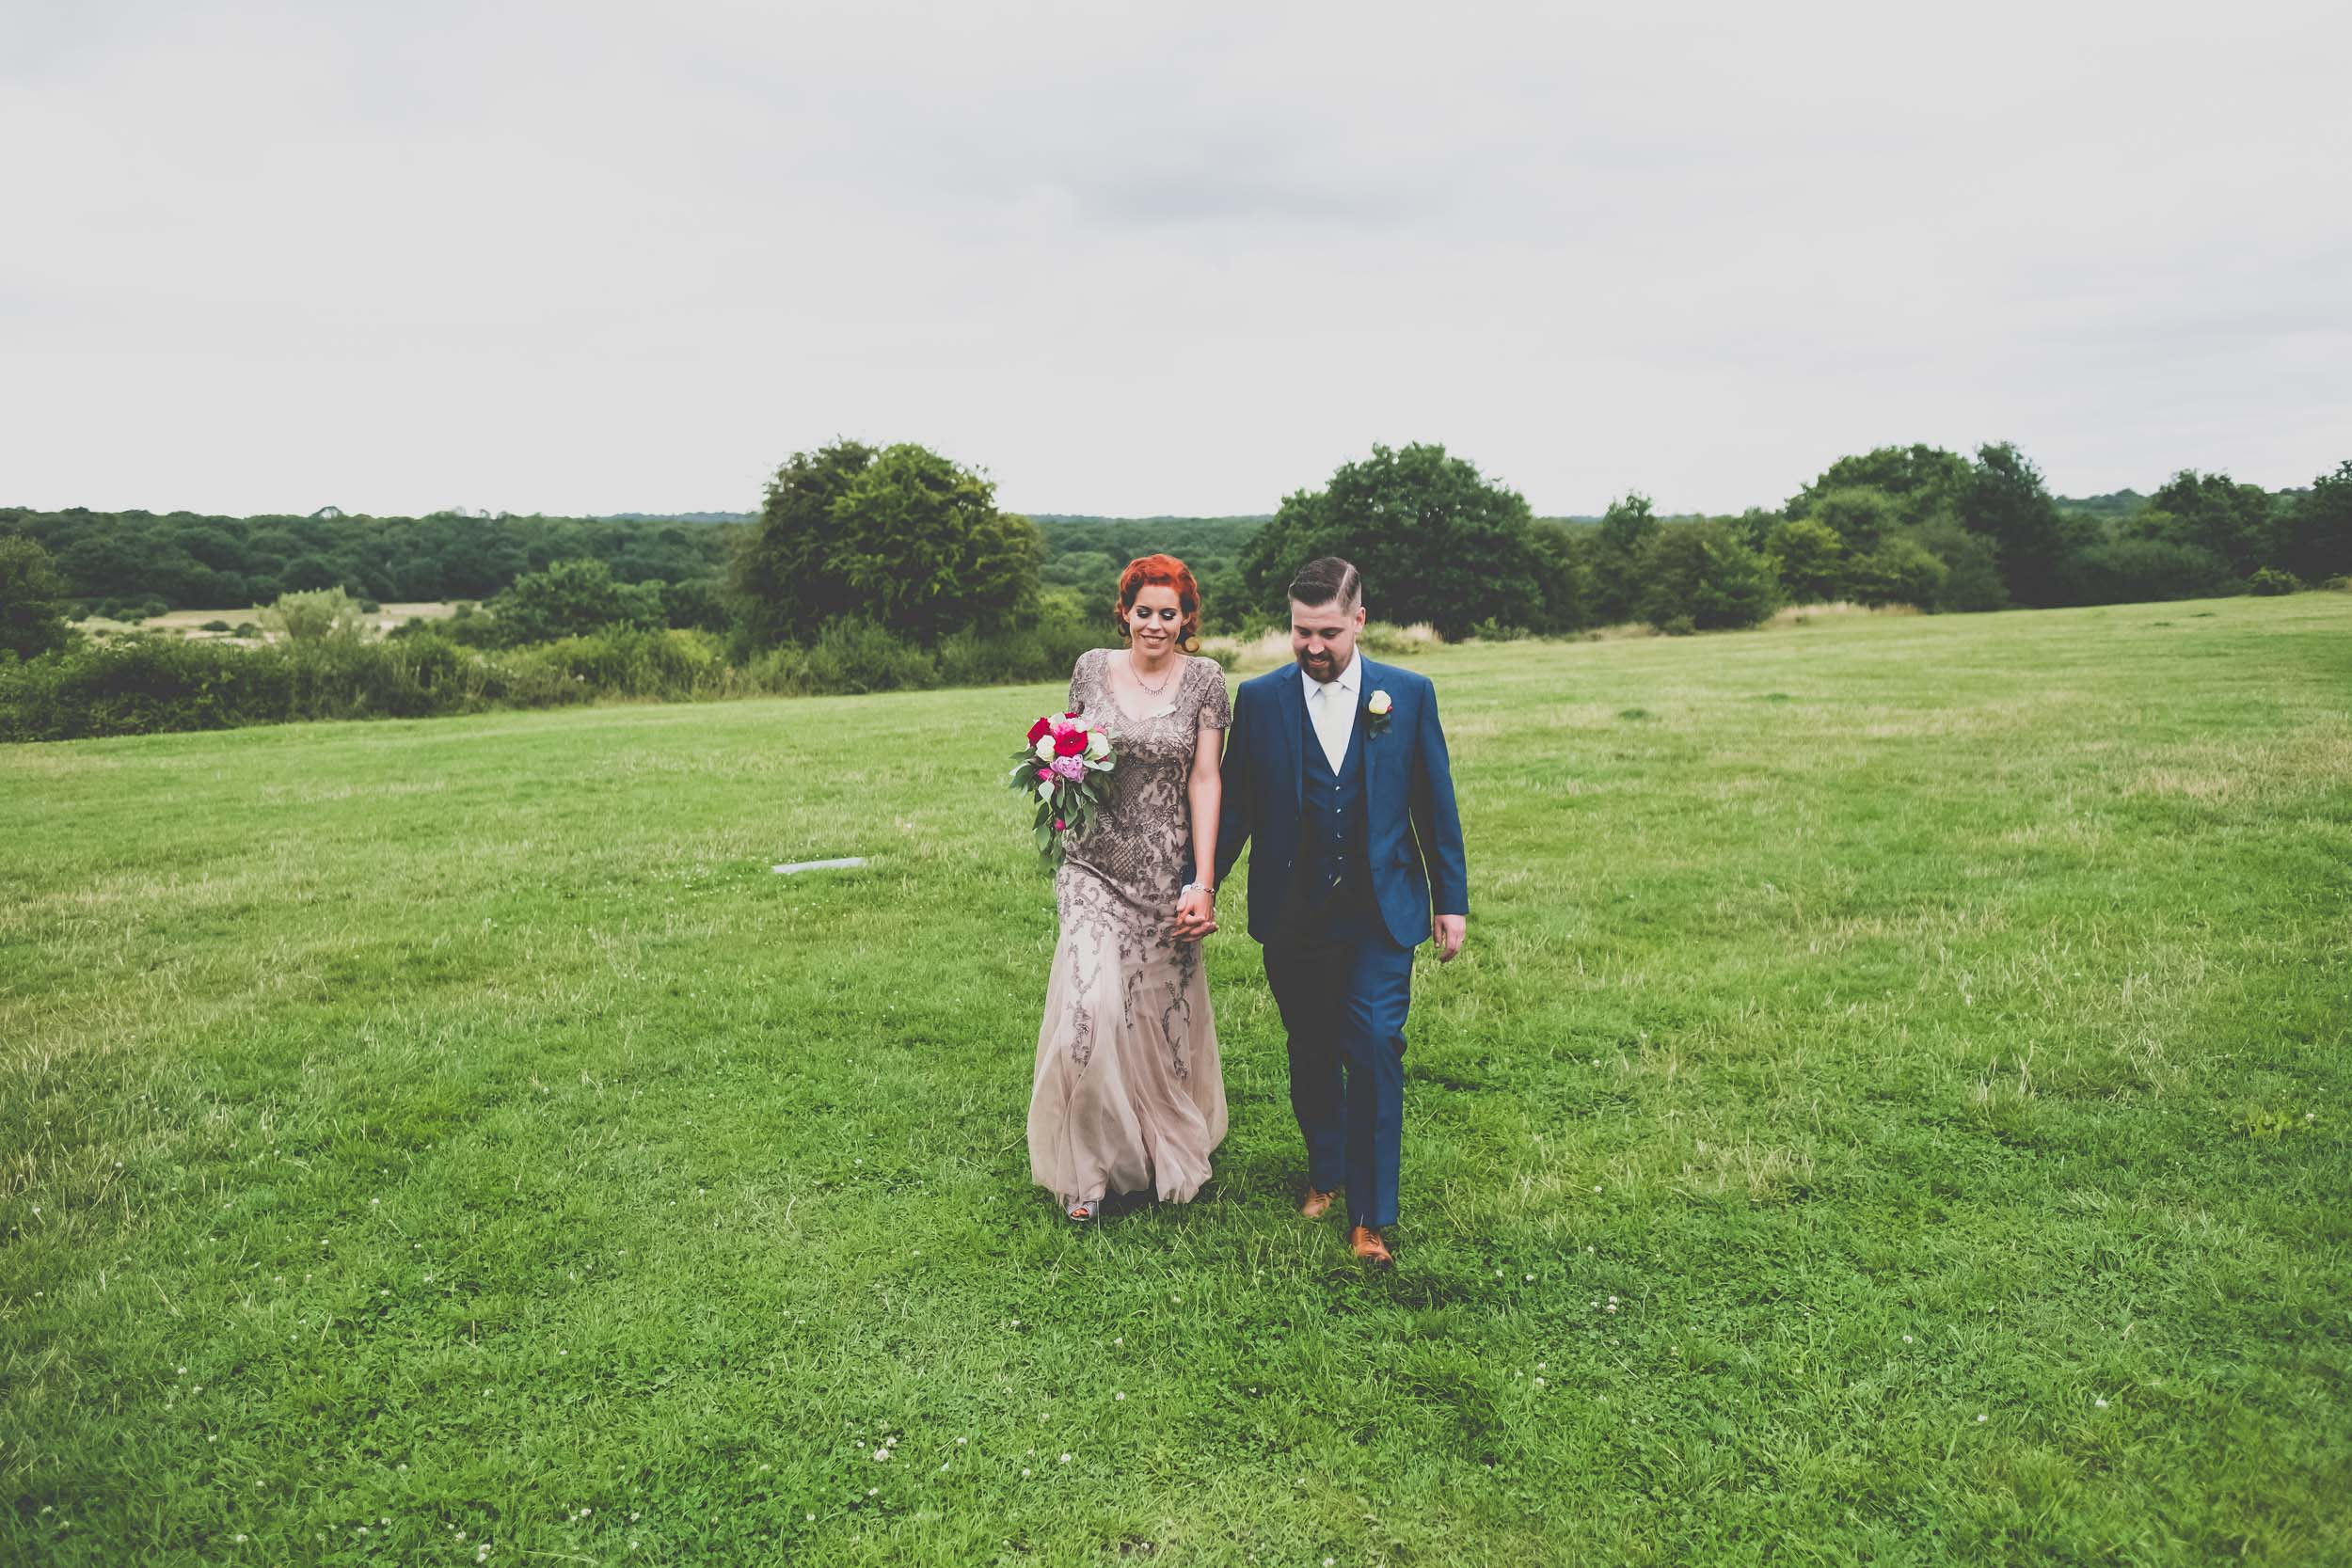 queen-elizabeths-hunting-lodge-epping-forest-wedding187.jpg